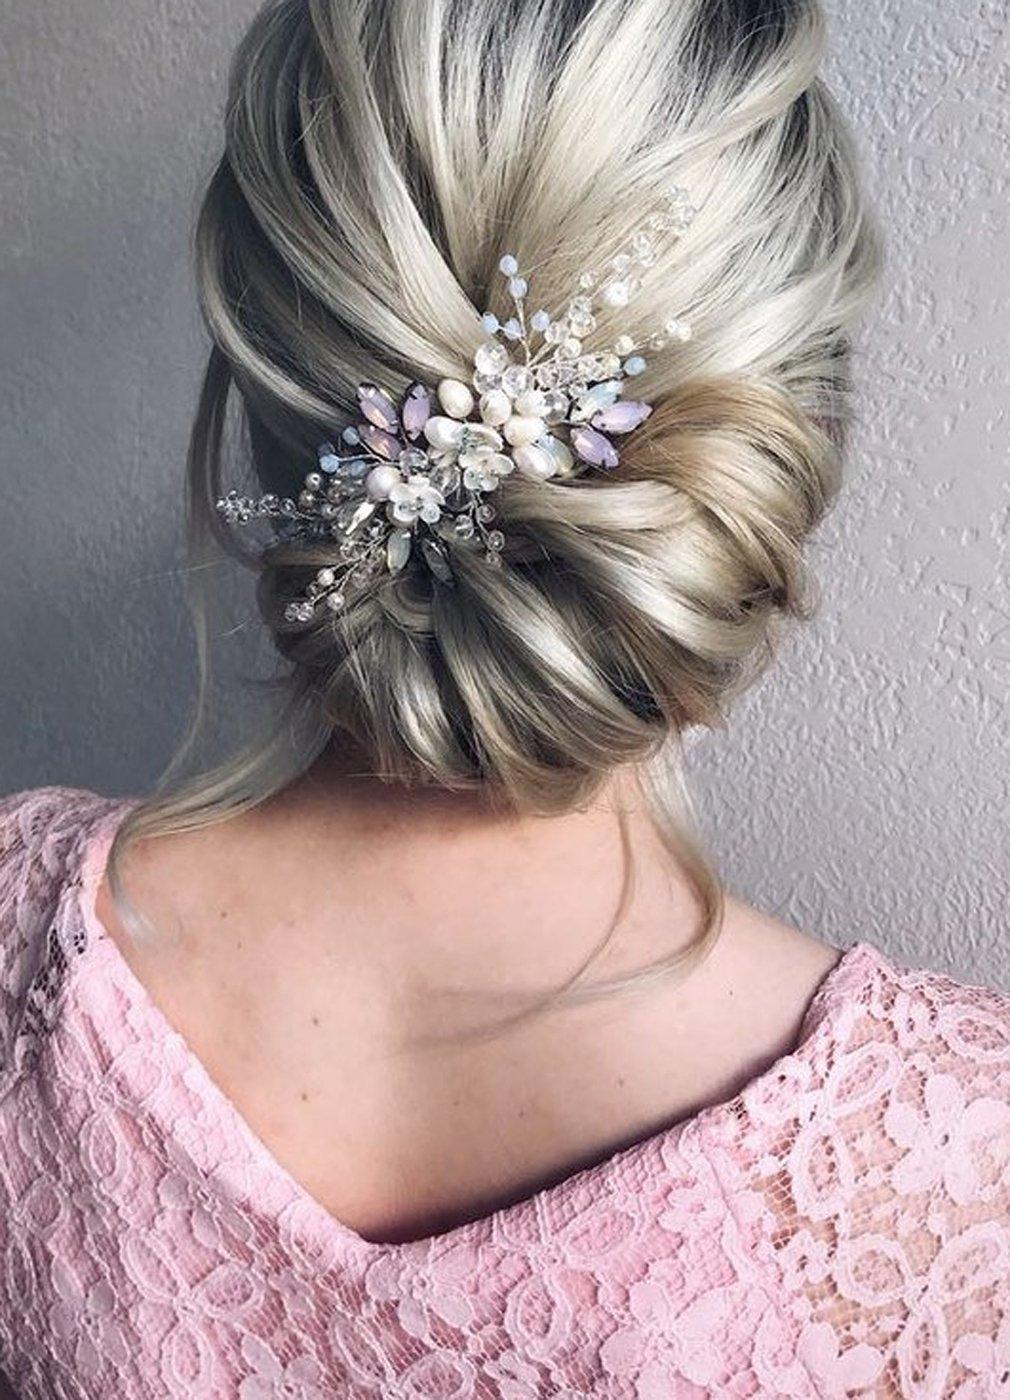 Kercisbeauty Wedding Bridal Bridesmaids Flower Girl Vintage Tiny Pearl Beads Purple and Blue Rhinestones White Flower Headband with Comb Bridal Hair Comb Headpiece Long Curly Bun Hair (Silver)